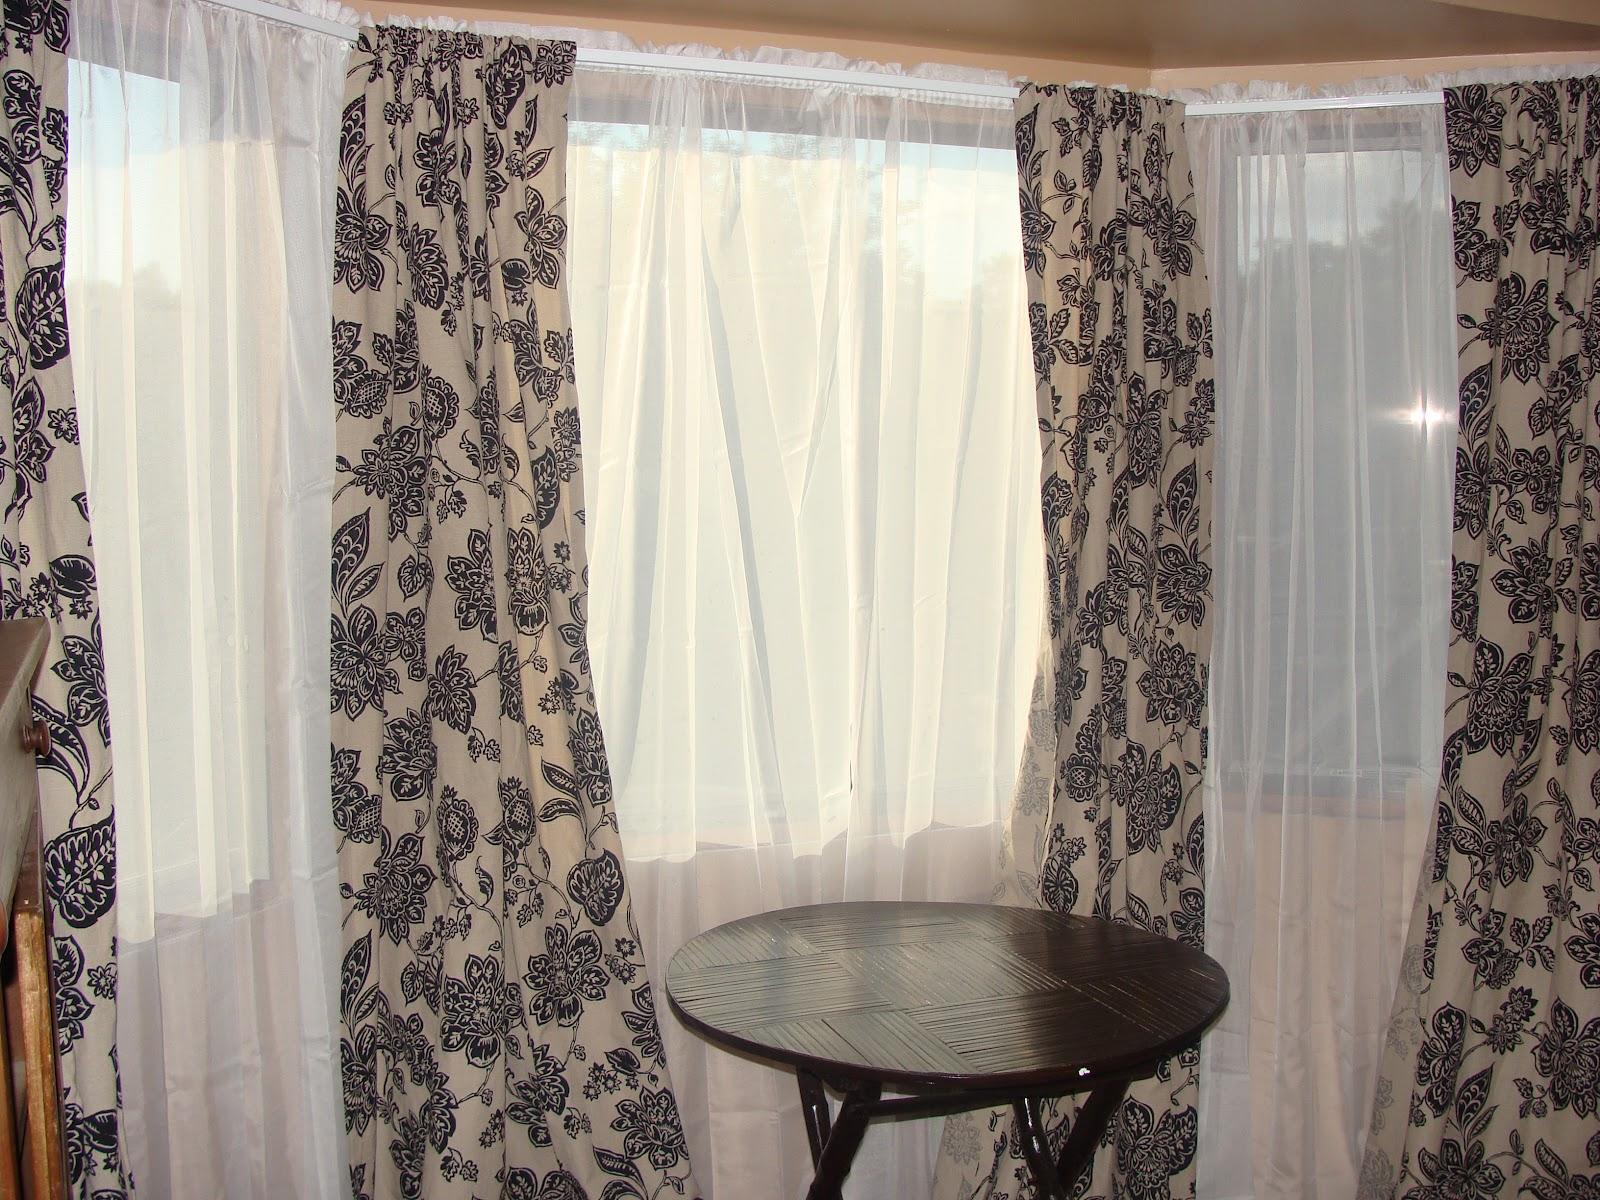 Owen Family Six Bay Window Curtains